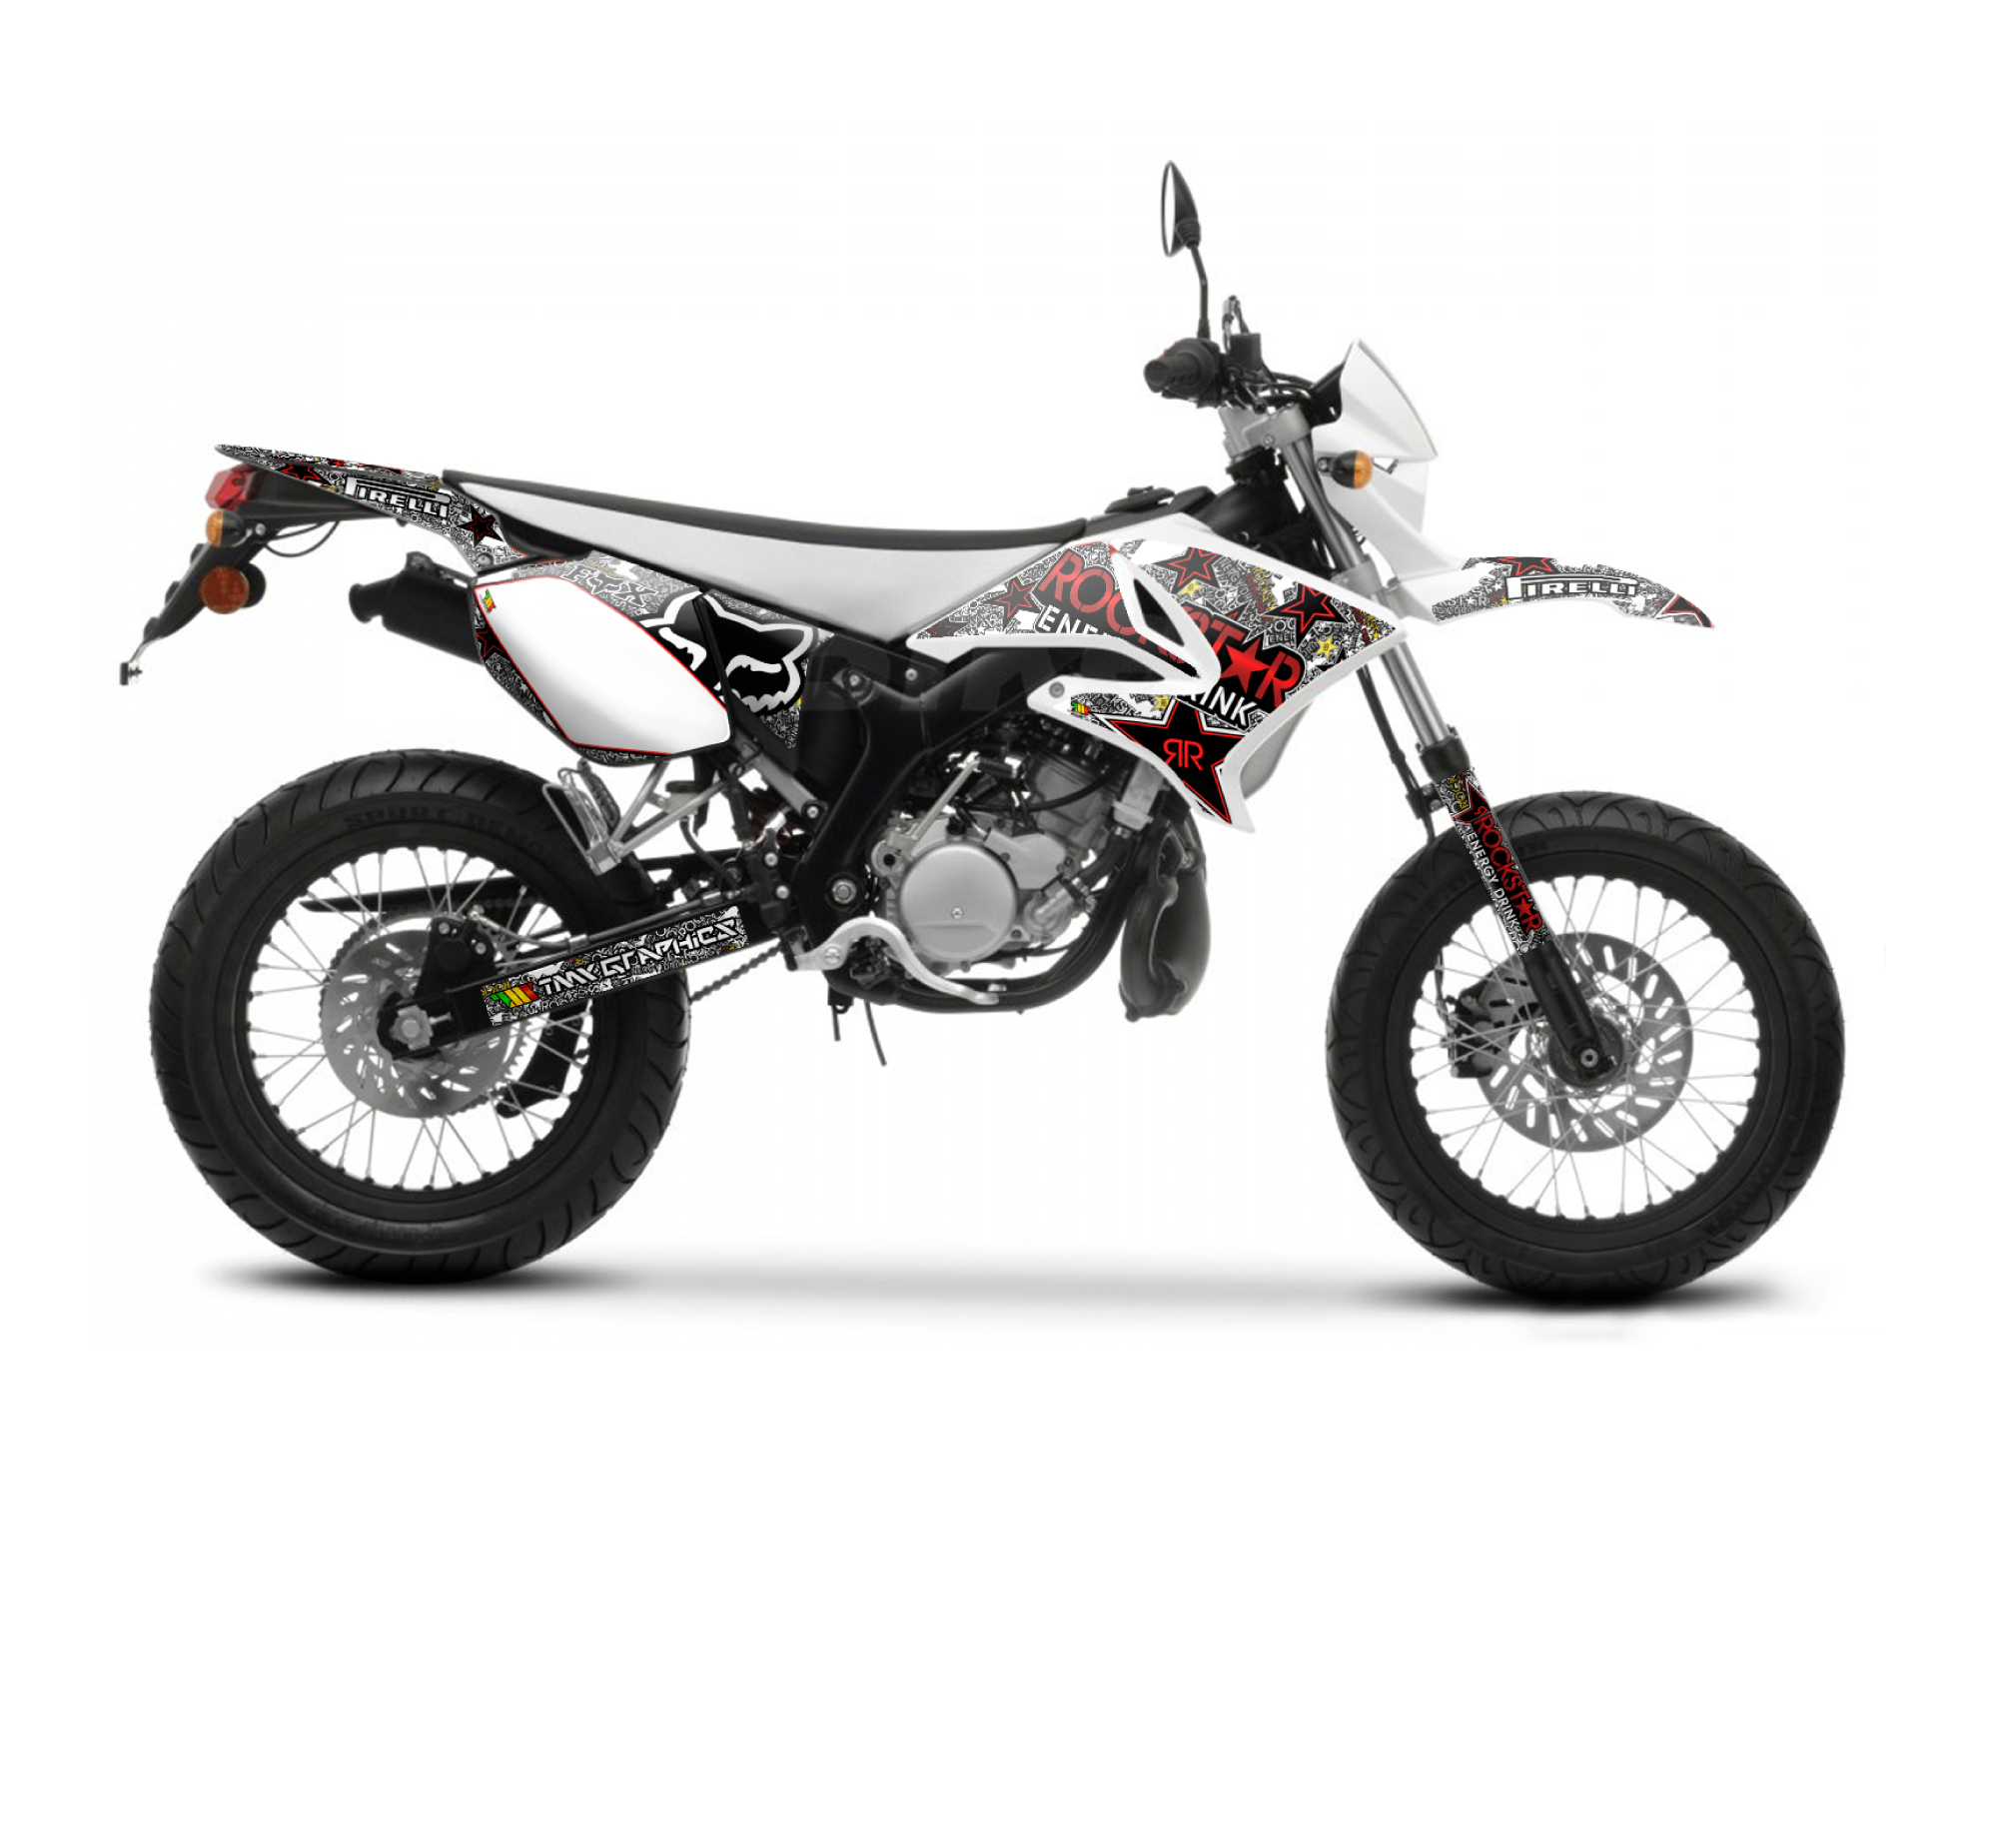 Yamaha dt 50 x r rockstar fox graphics series white for Yamaha warranty registration